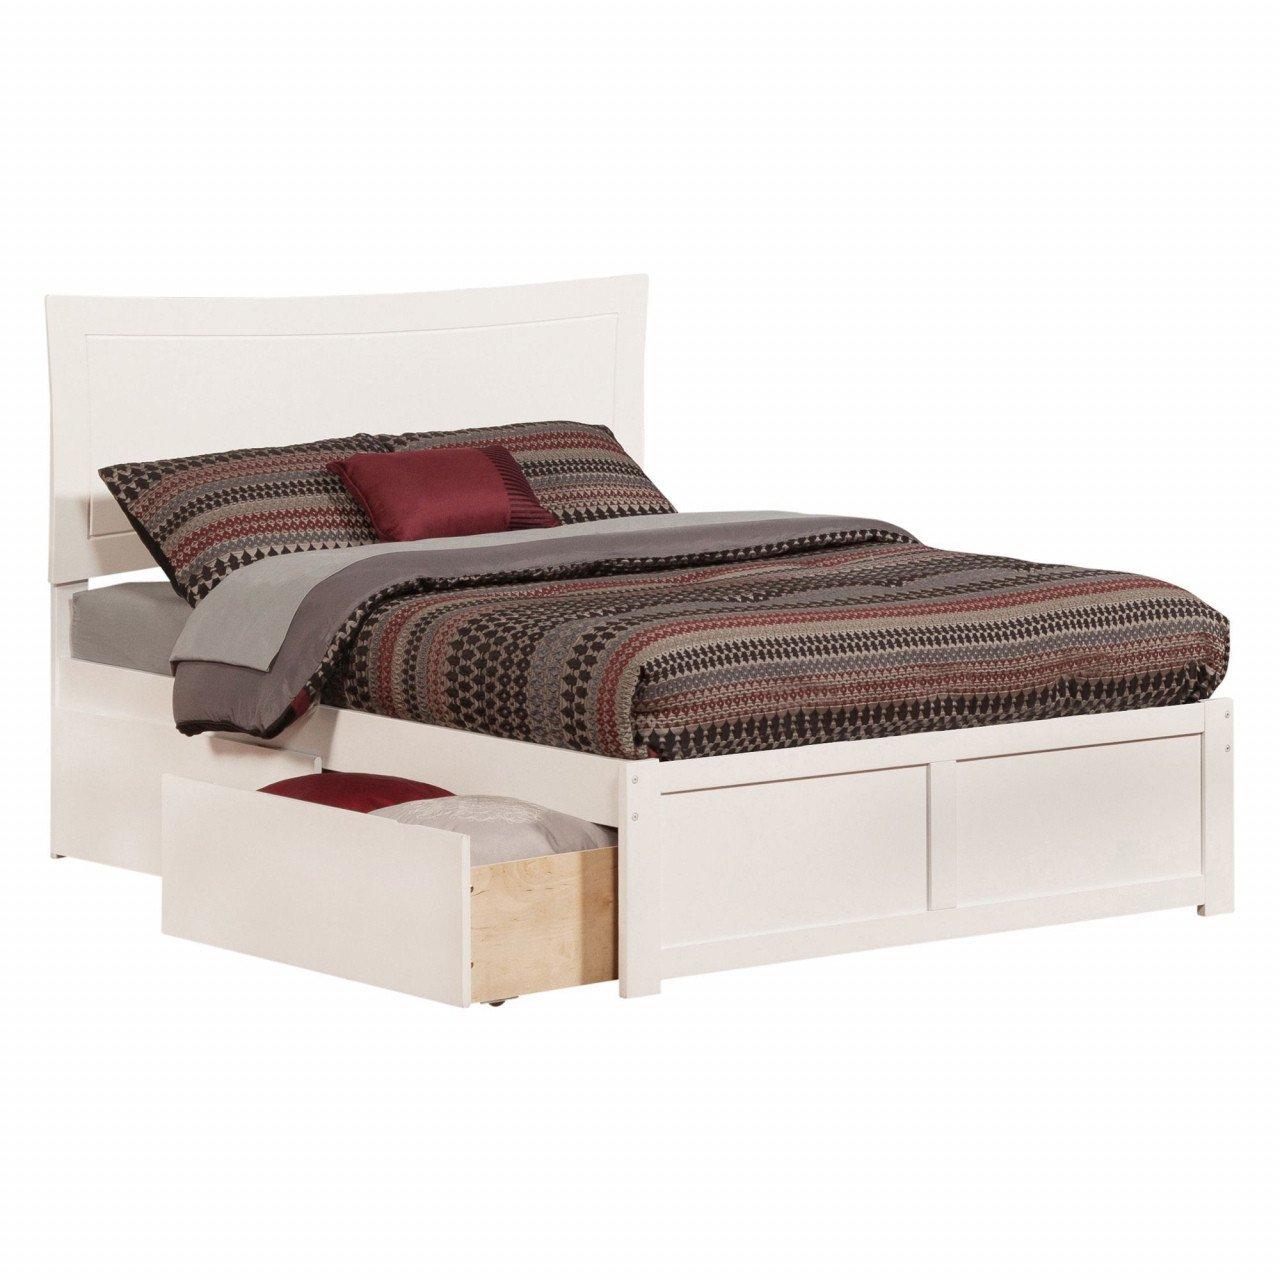 Hammock Bed for Bedroom Unique Drawers Under Bed — Procura Home Blog